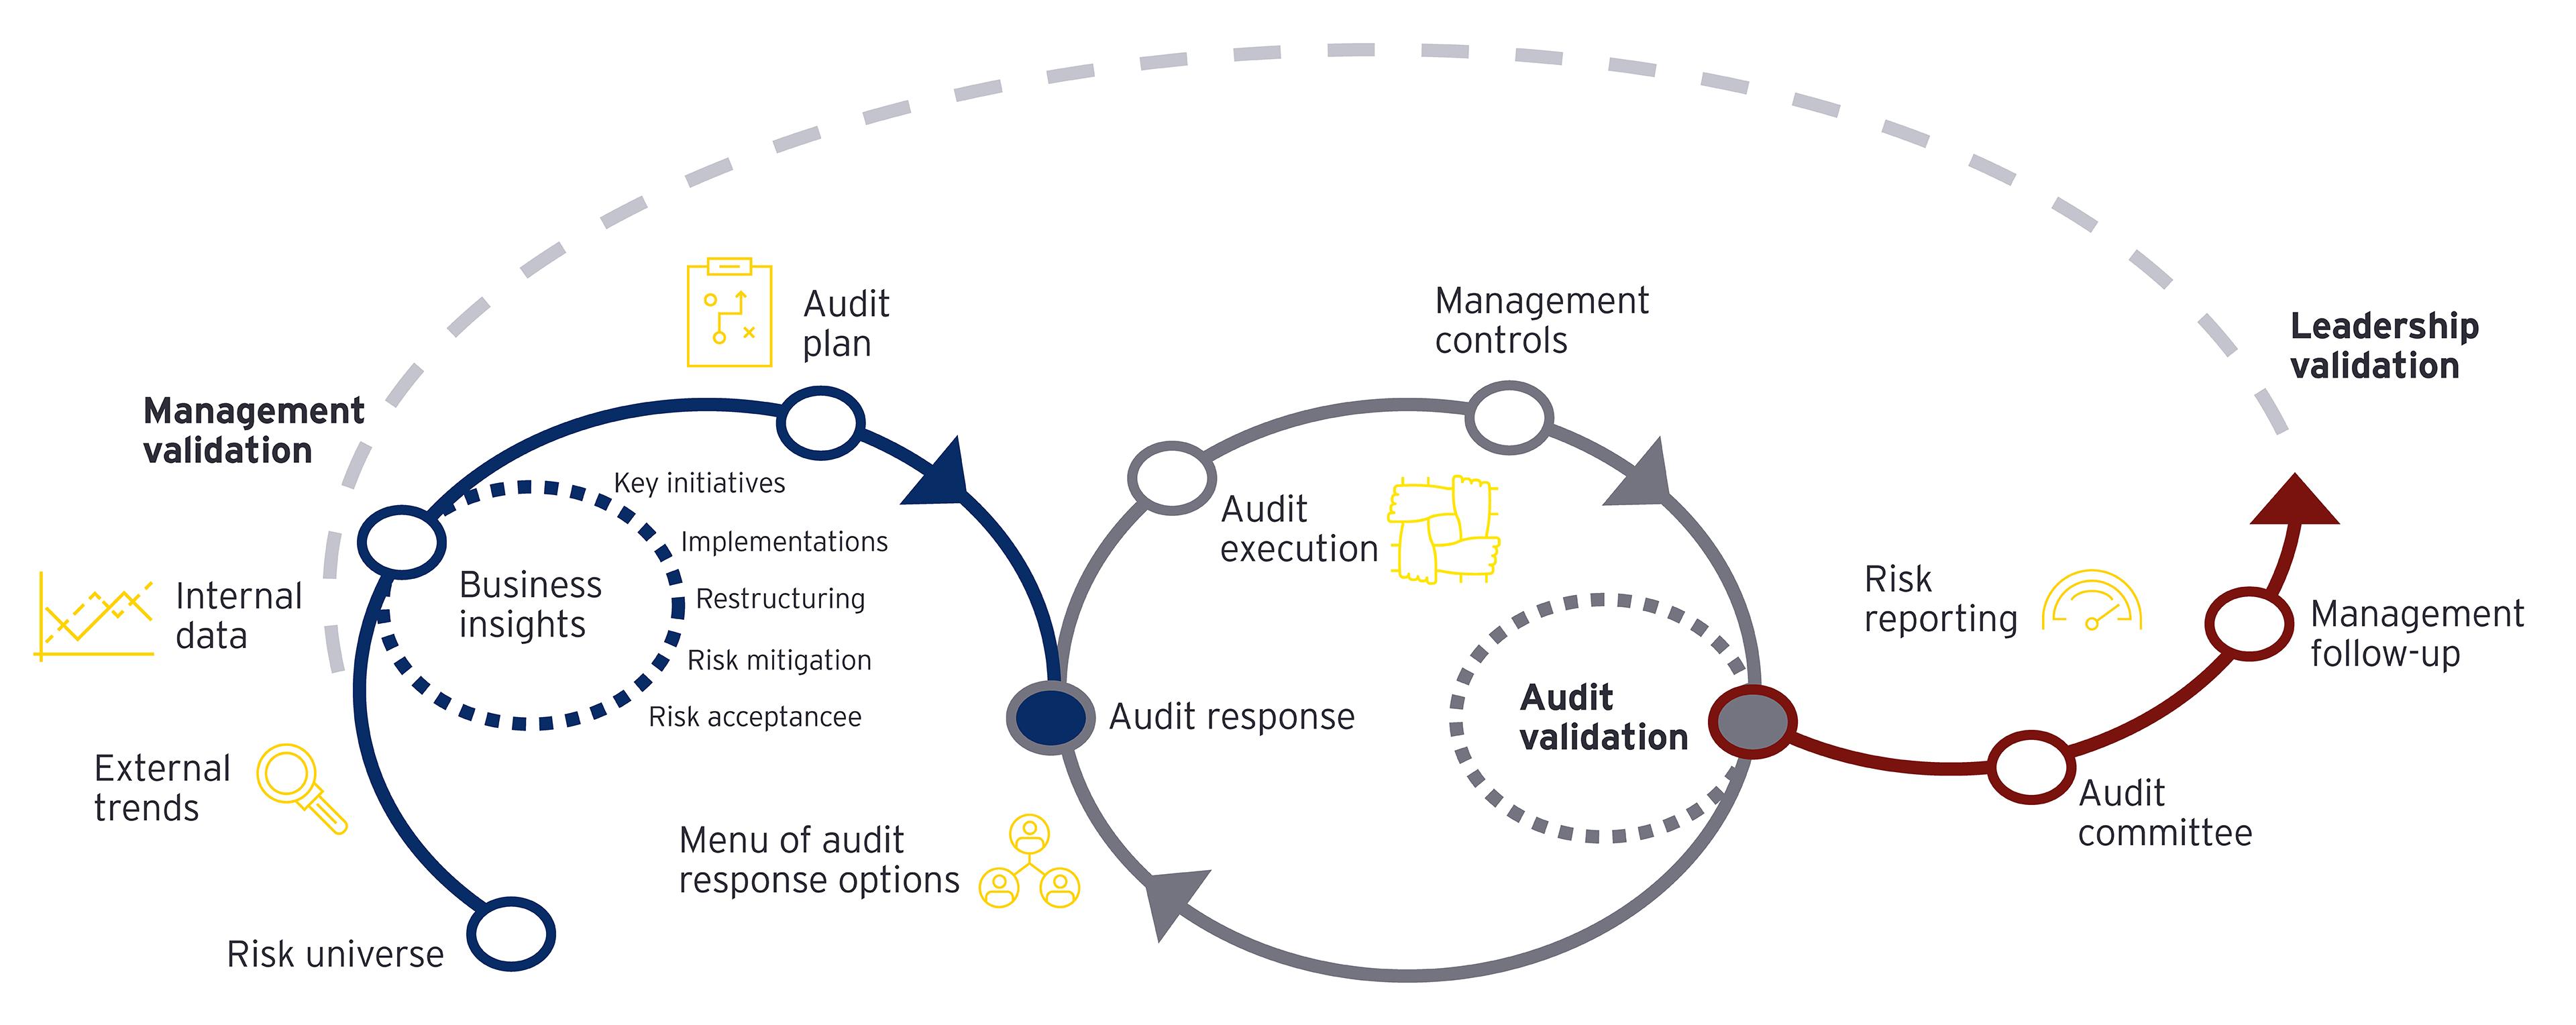 EY Management validation diagram